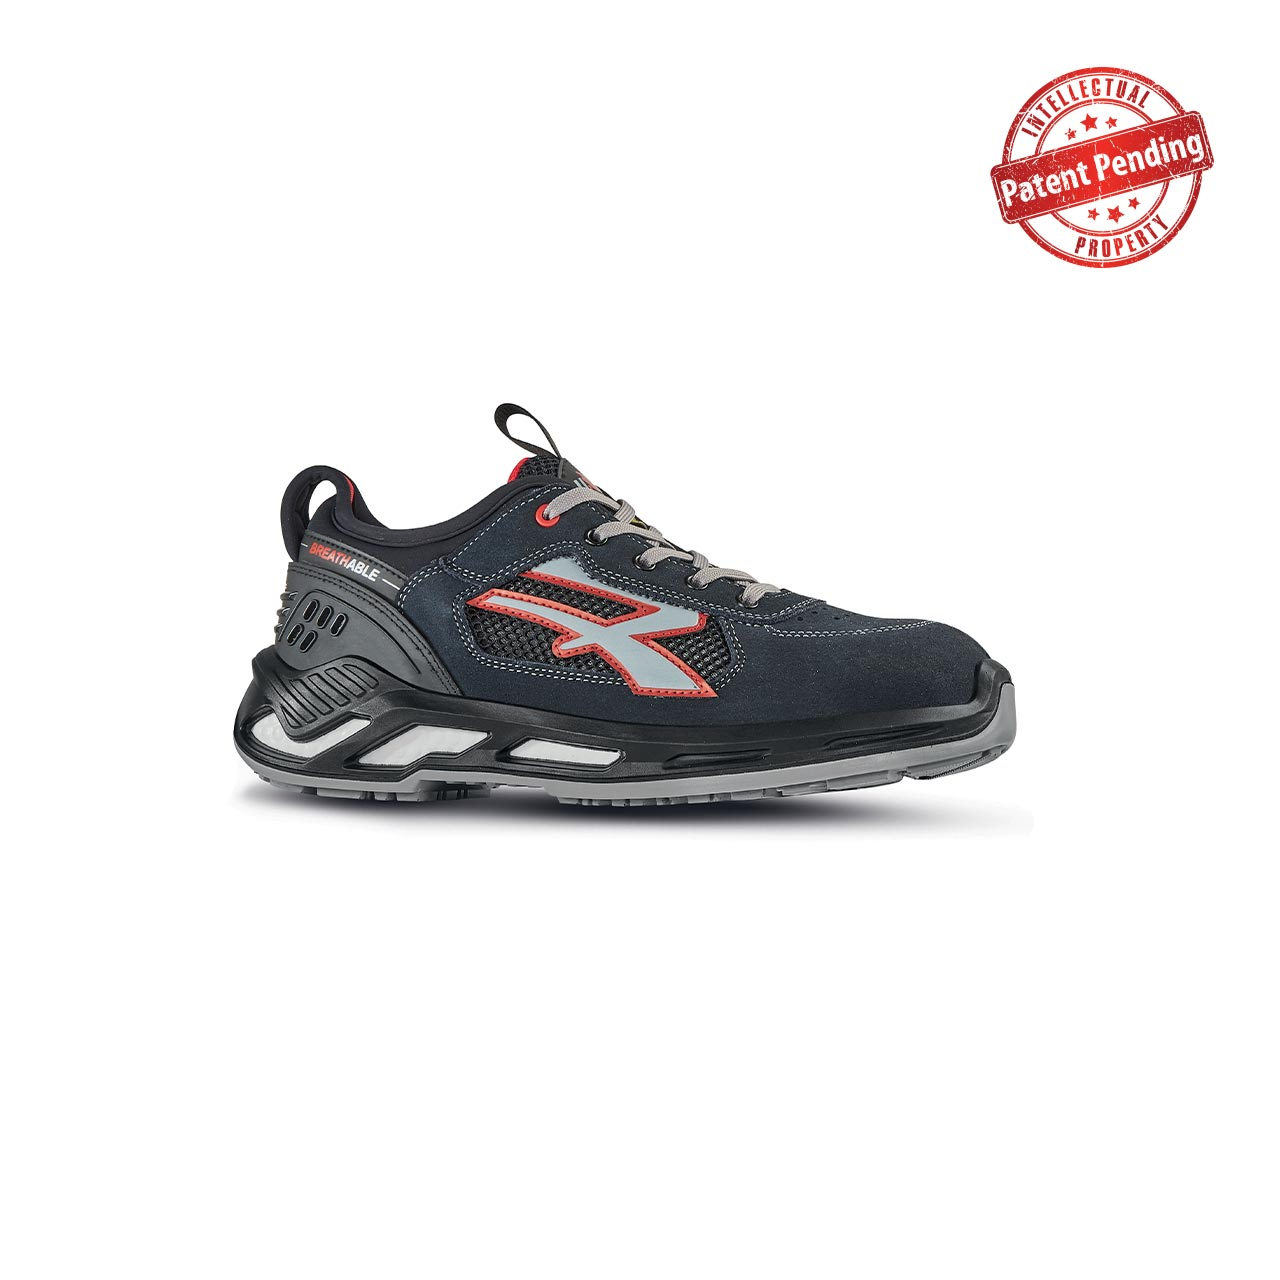 scarpa antinfortunistica upower modello gang linea red360 vista laterale